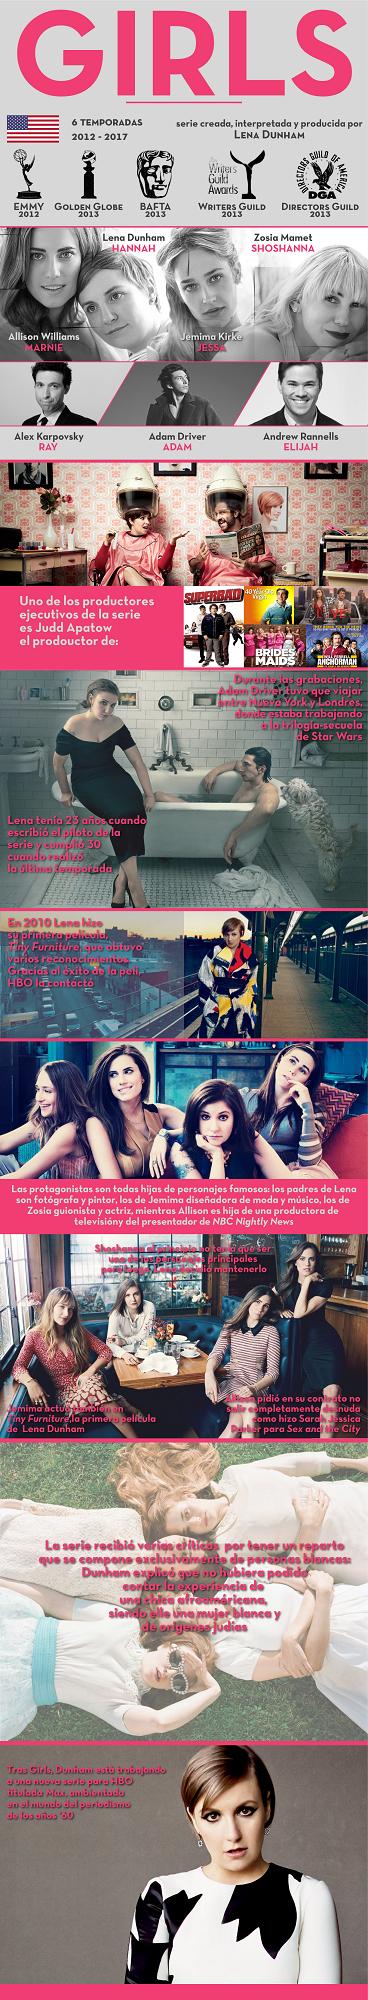 curiosidades de la serie girls